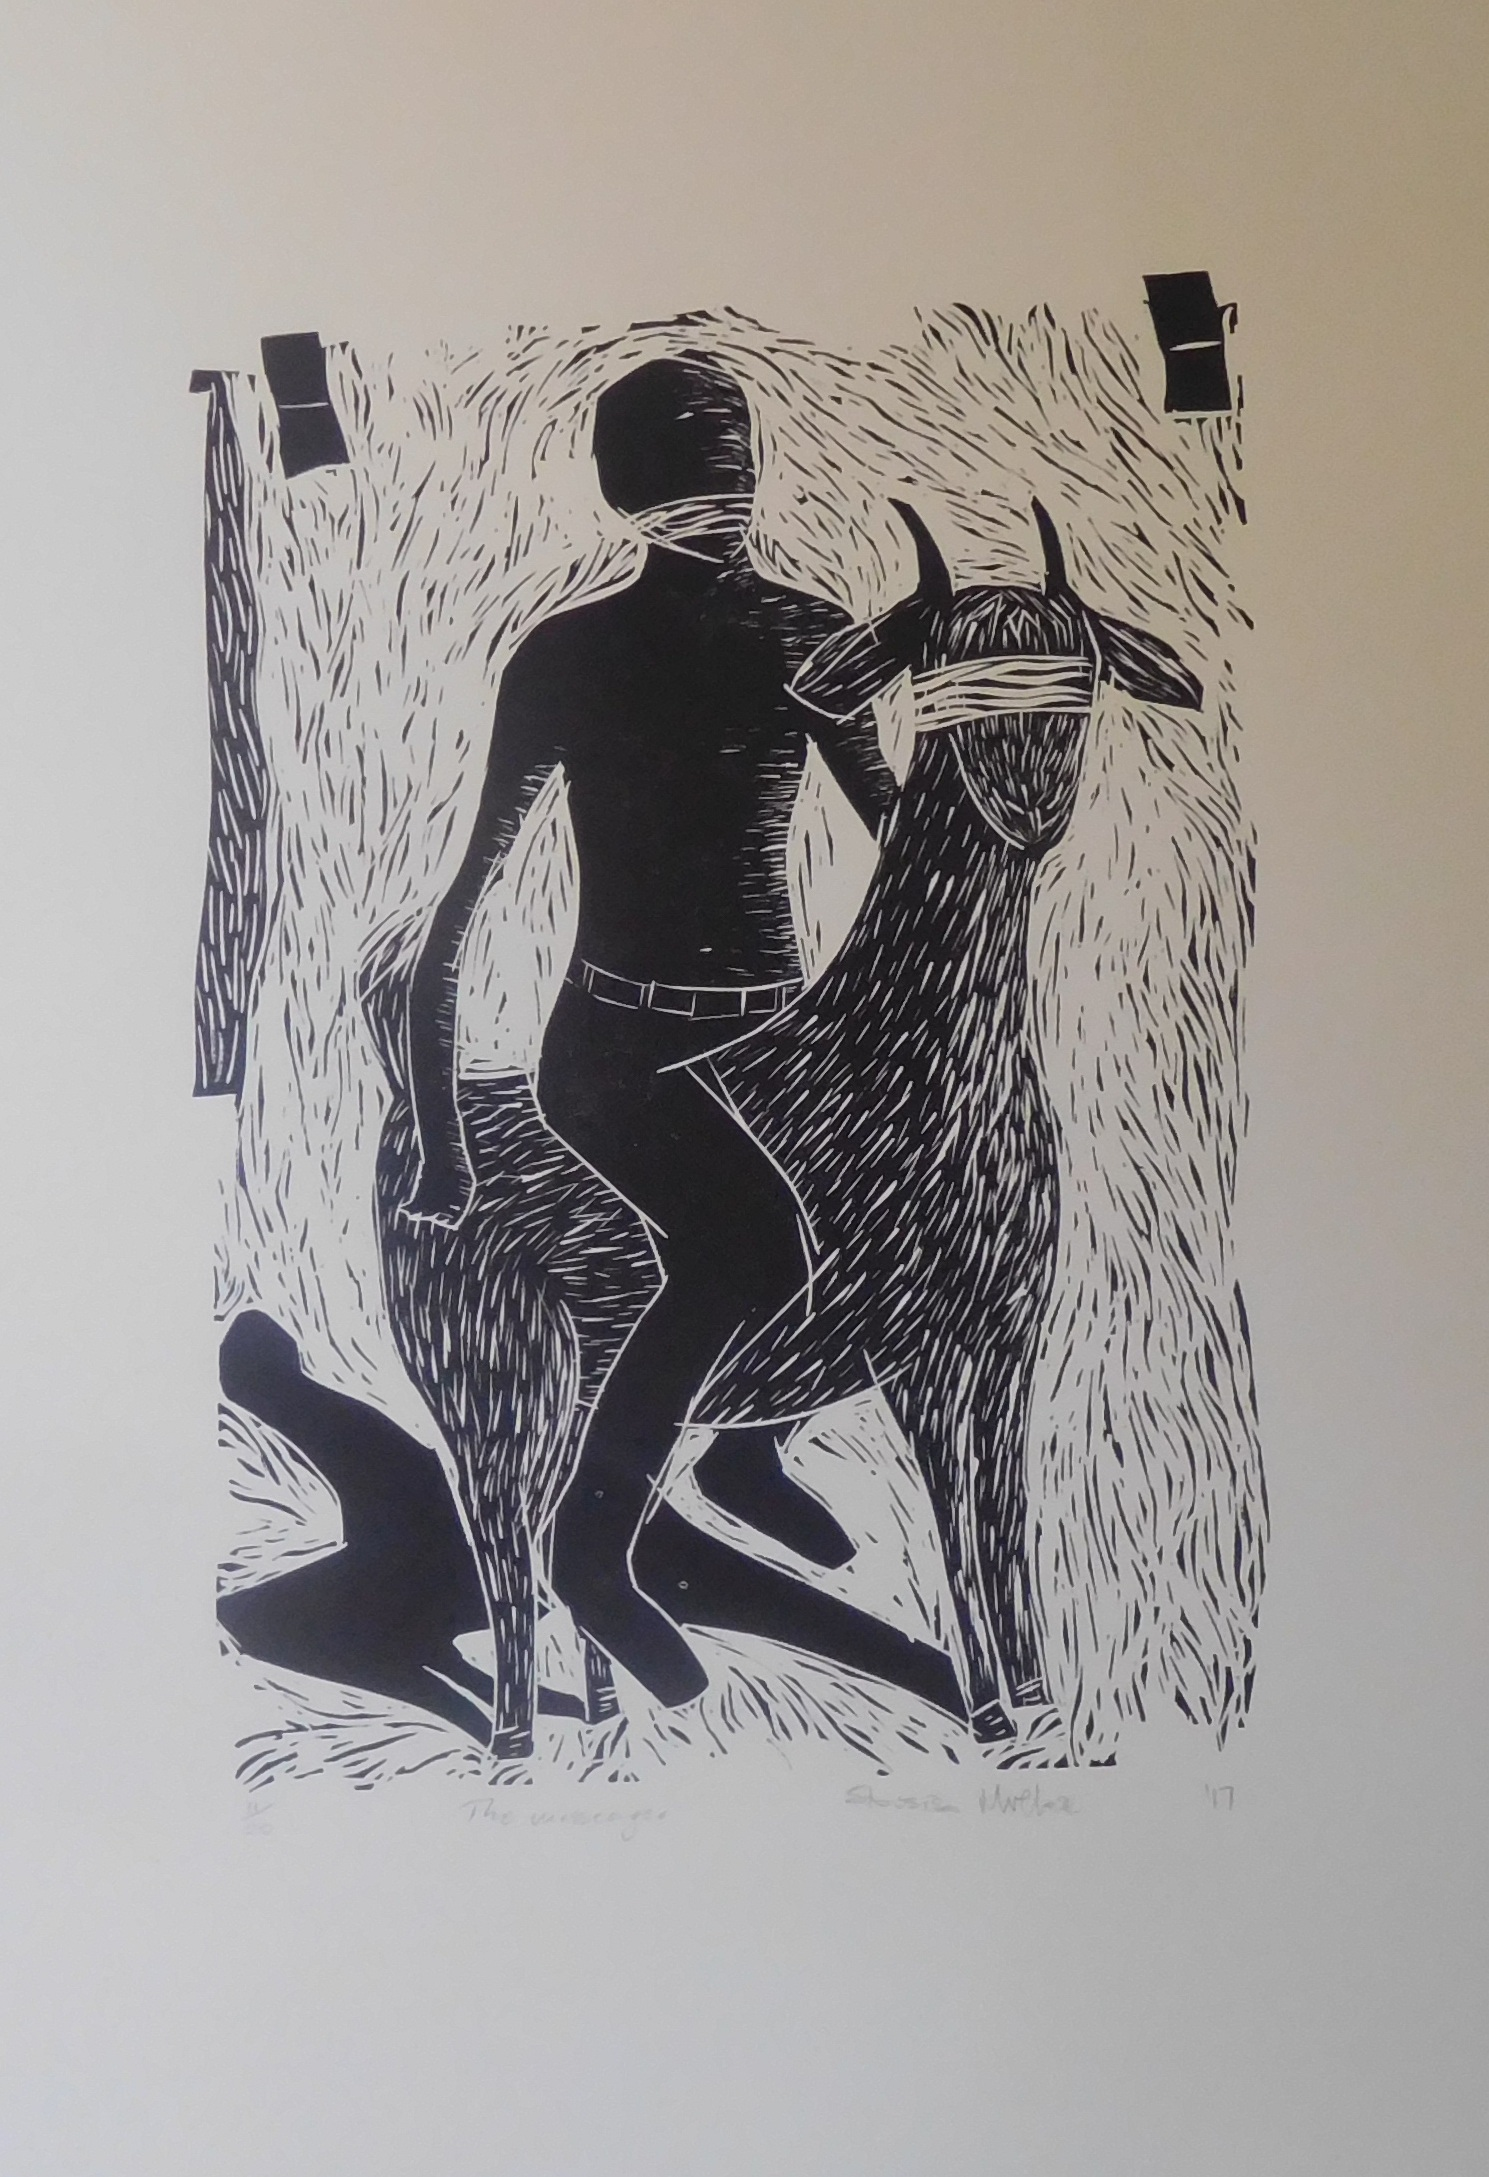 Above: Sibusiso Mvelase, The Messenger, linocut print